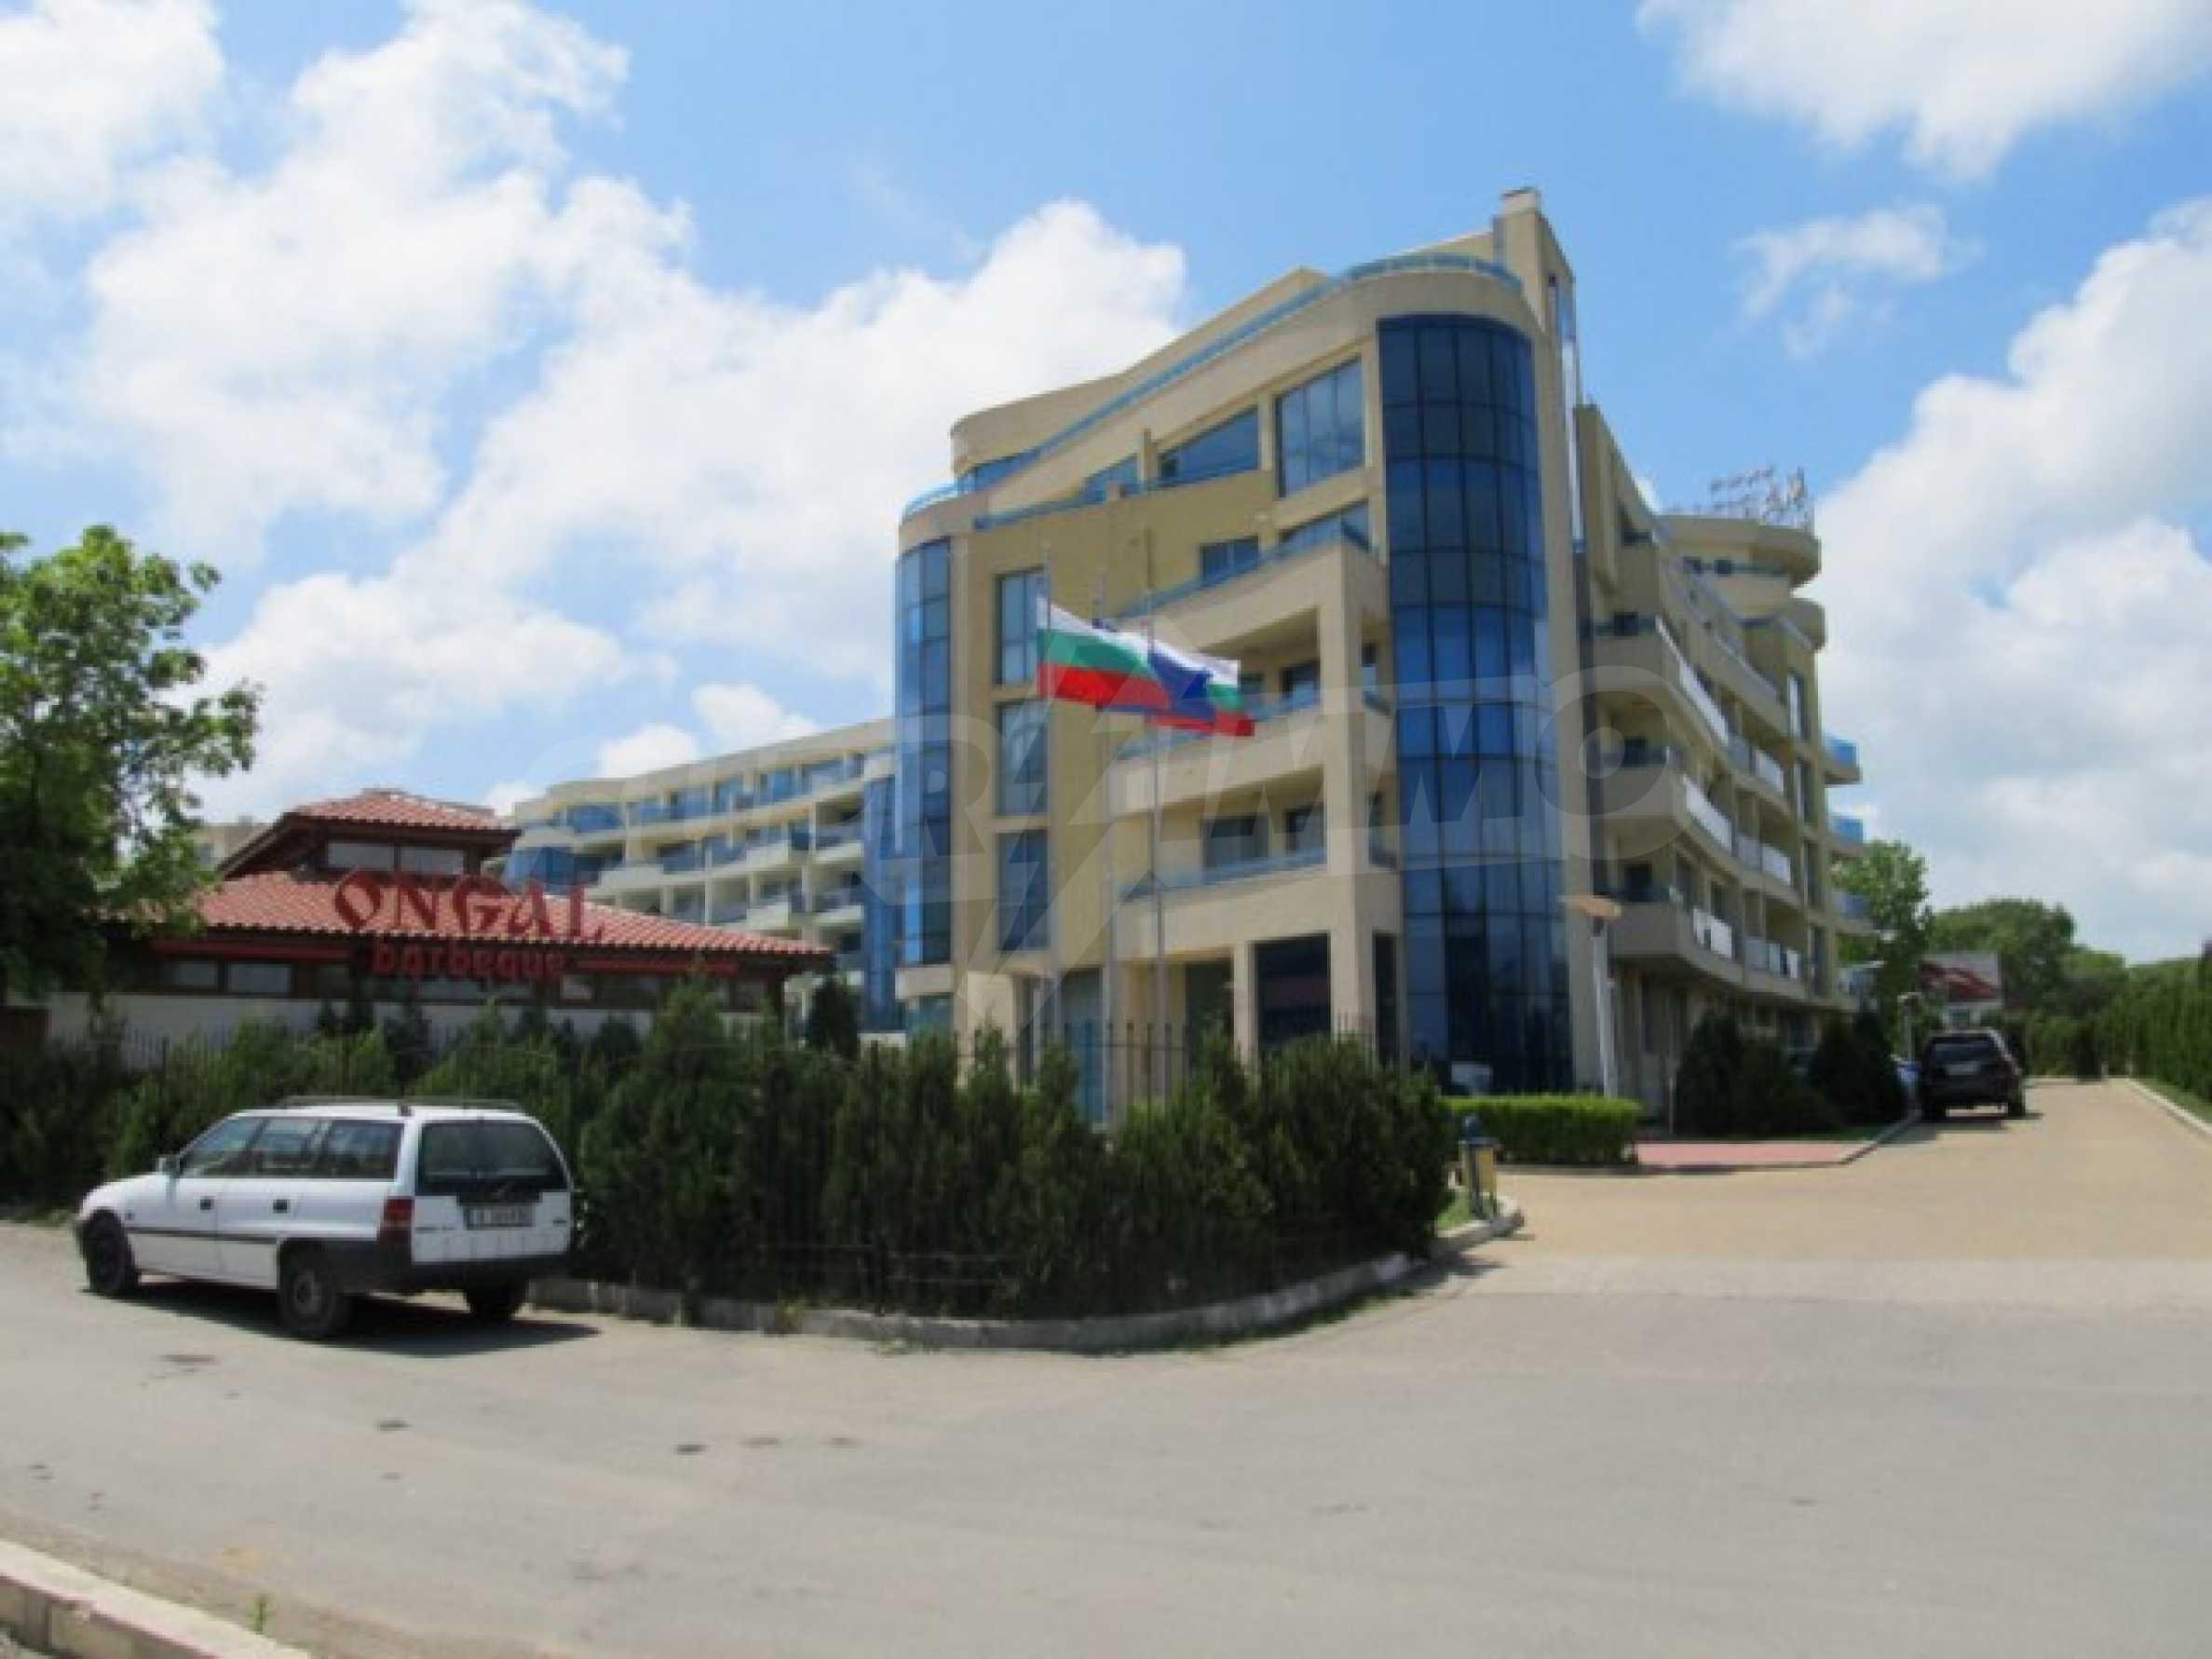 Тристаен апартамент за продажба в Поморие 1